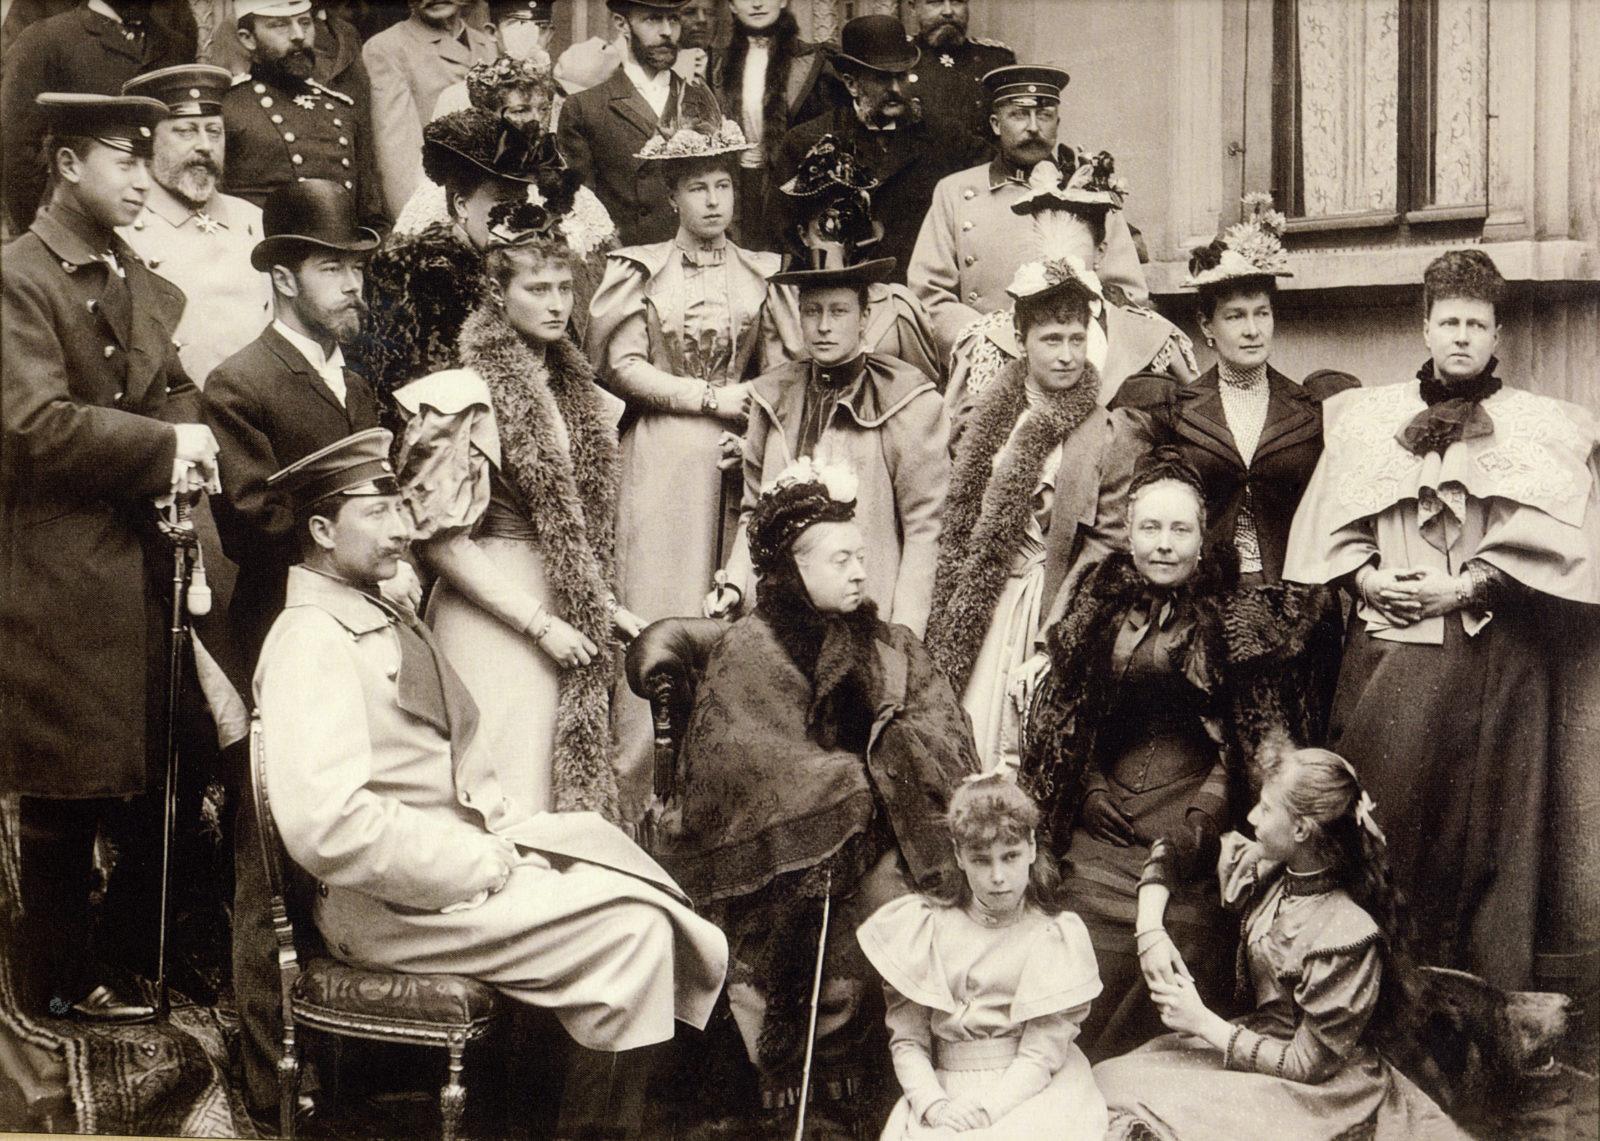 Queen Victoria of Britain, Kaizer Of Germany Wilhelm, Nicholas II, Empress Alexandra Feodorovna and members of European Royal Families. Koburg, 1894